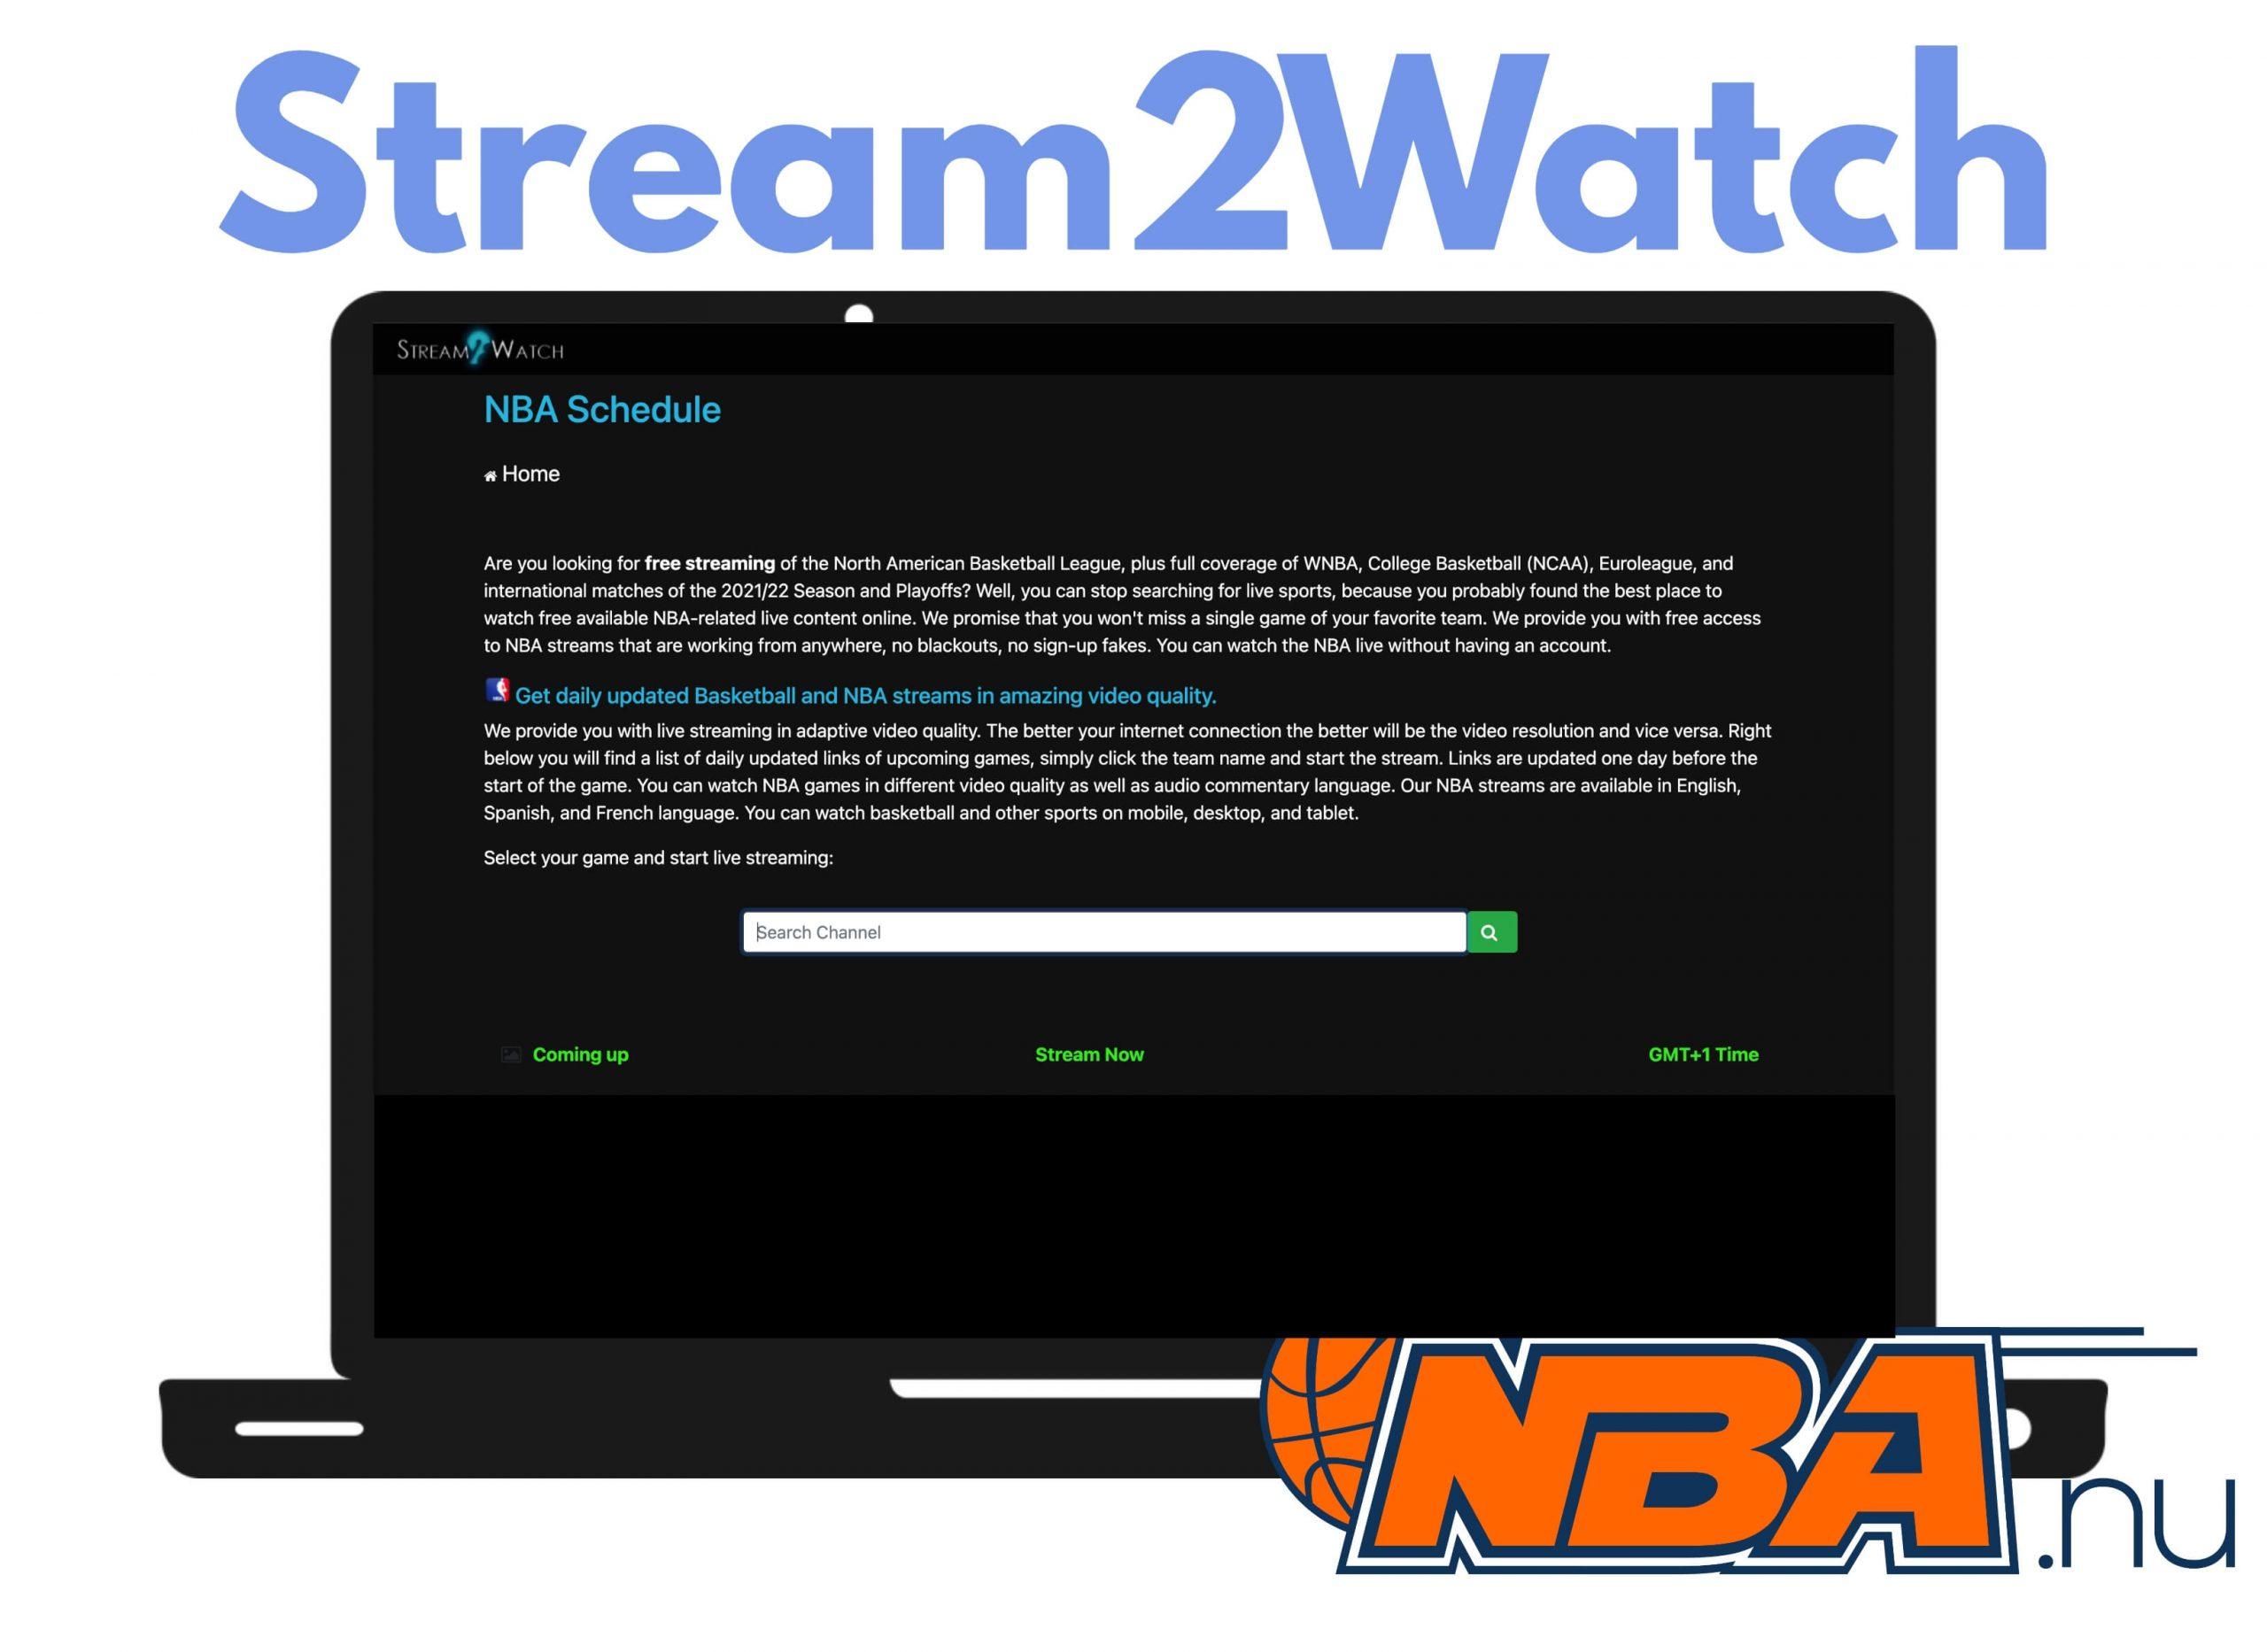 dator-hemsida-stream2watch-nba.nu